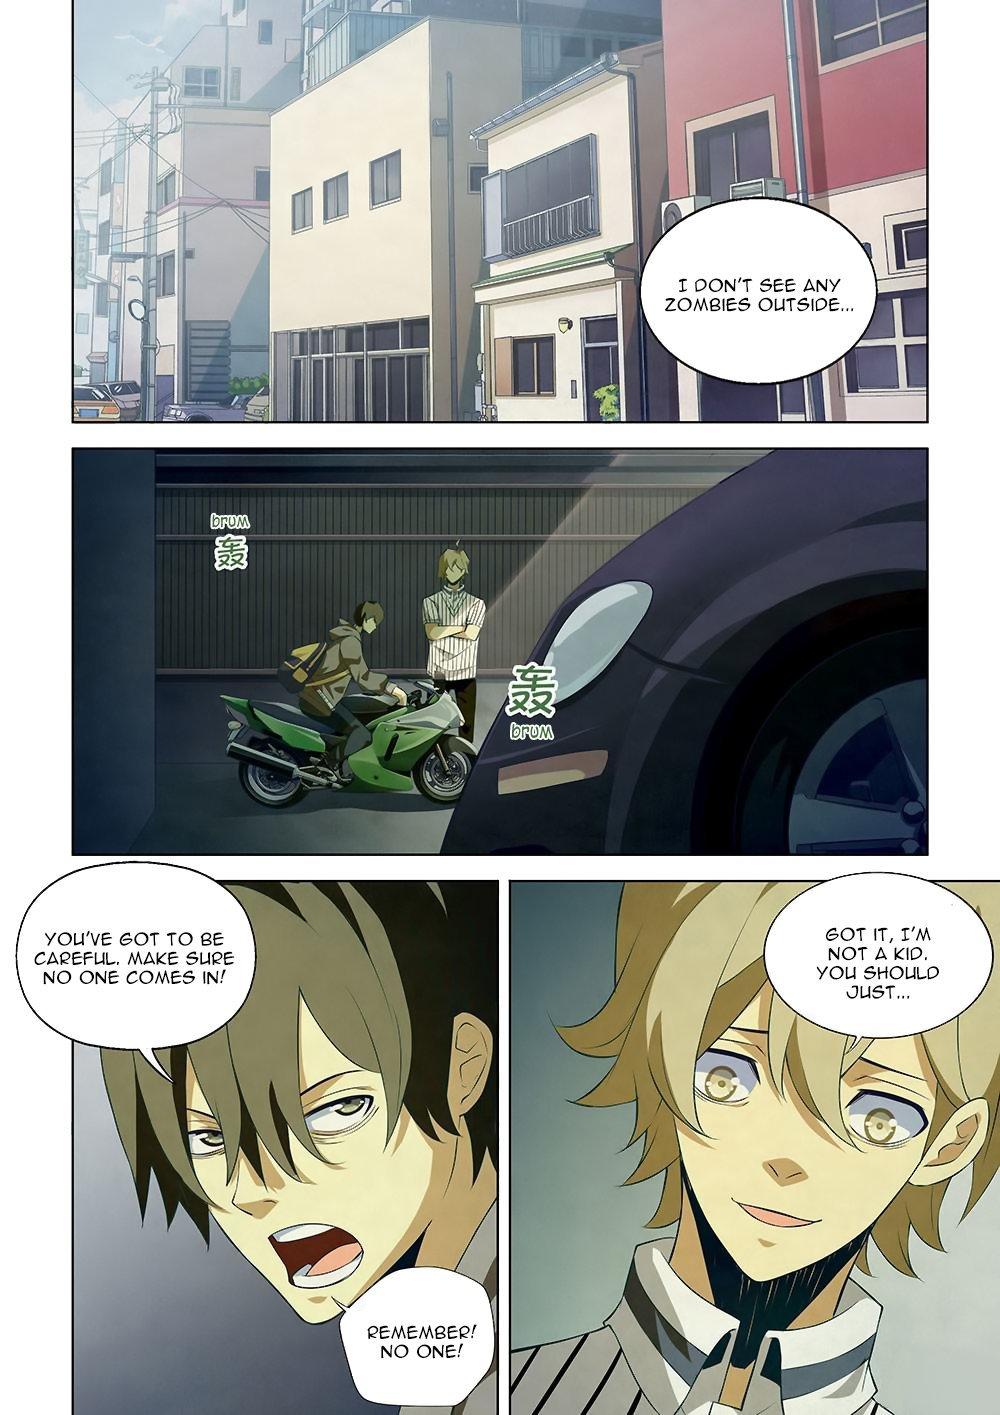 https://im.nineanime.com/comics/pic9/52/23540/511305/2ce46e16e28e2ff305109bfc295a481a.jpg Page 1